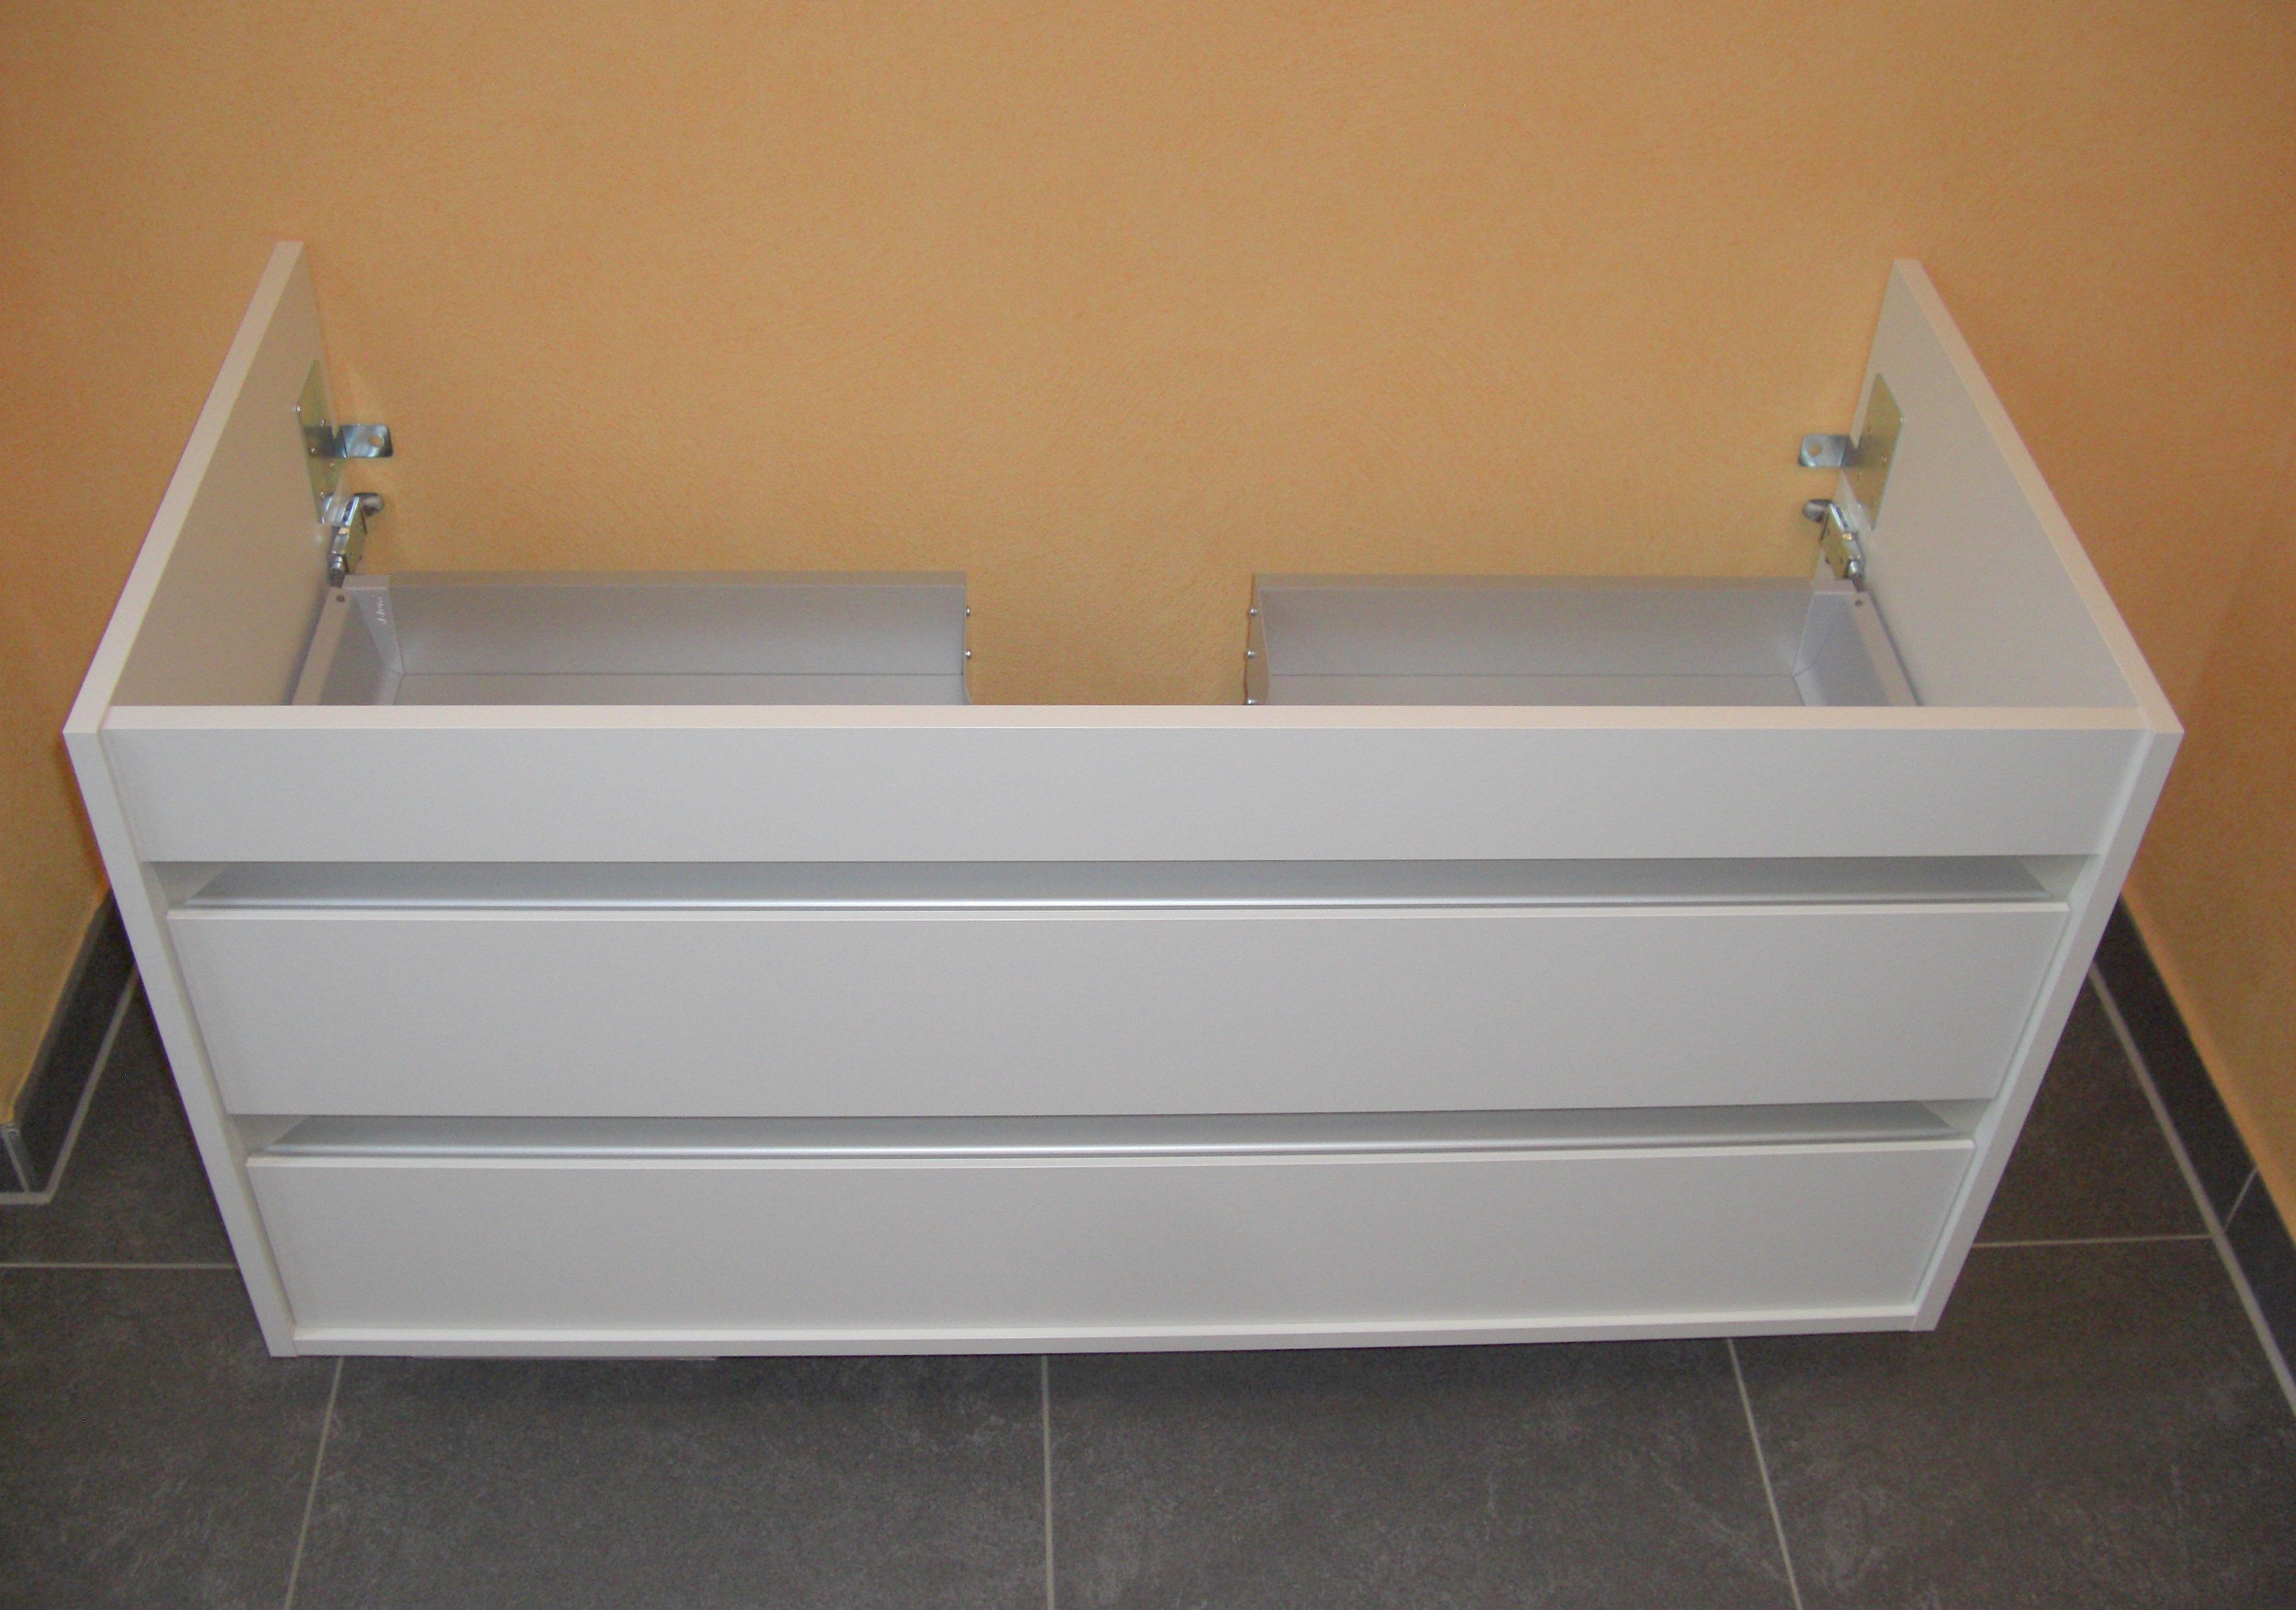 duravit ketho waschbeckenunterbau basalt matt 65x44cm f r vero 045470 kt662404343 bernd. Black Bedroom Furniture Sets. Home Design Ideas